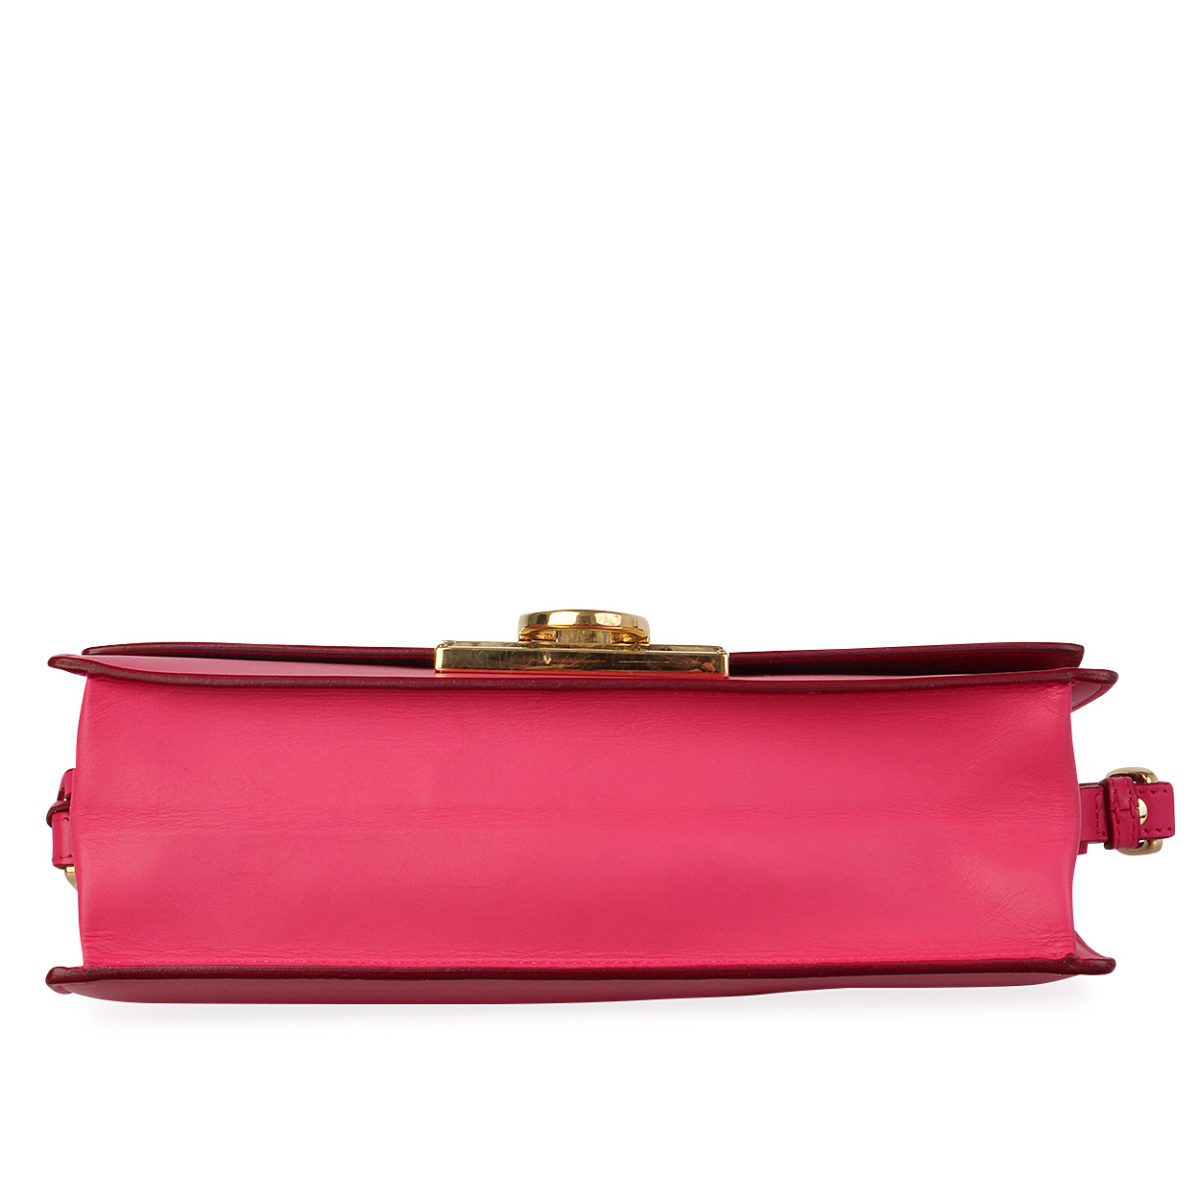 8a2d7c484074 SALVATORE FERRAGAMO Leather Aileen Cross Body Bag Pink